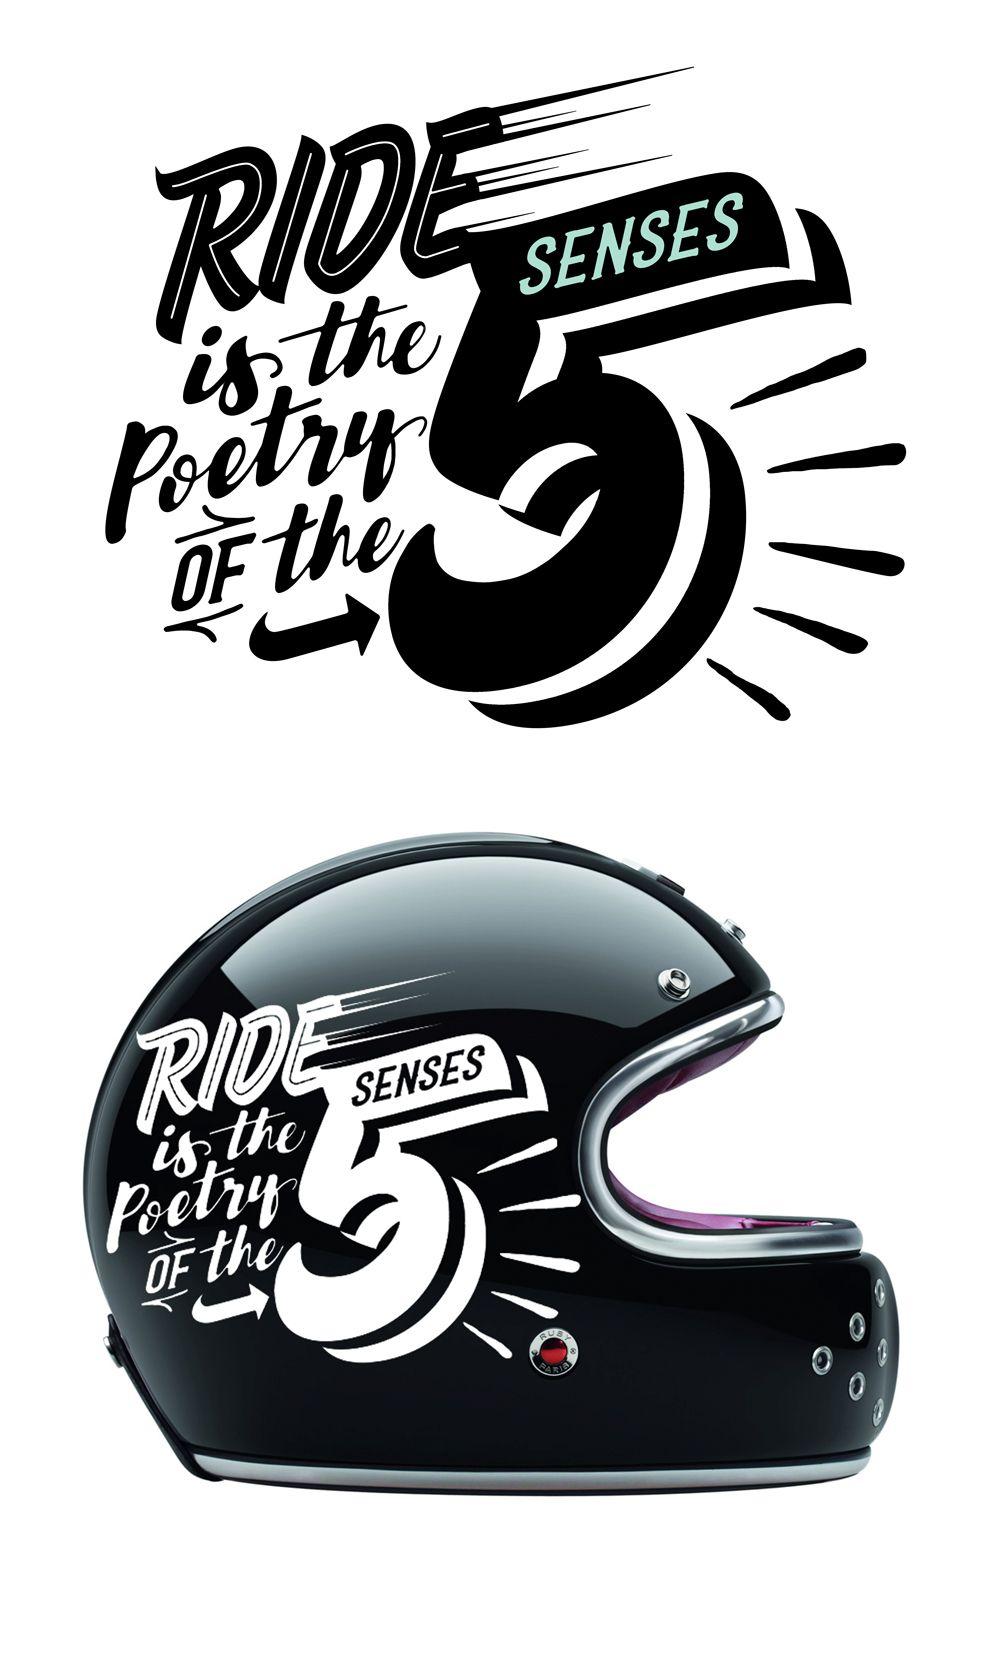 5 Senses Helmet For Crd Cafe Racer Dreams Motorcycle Helmet Design Cafe Racer Helmet Vintage Helmet